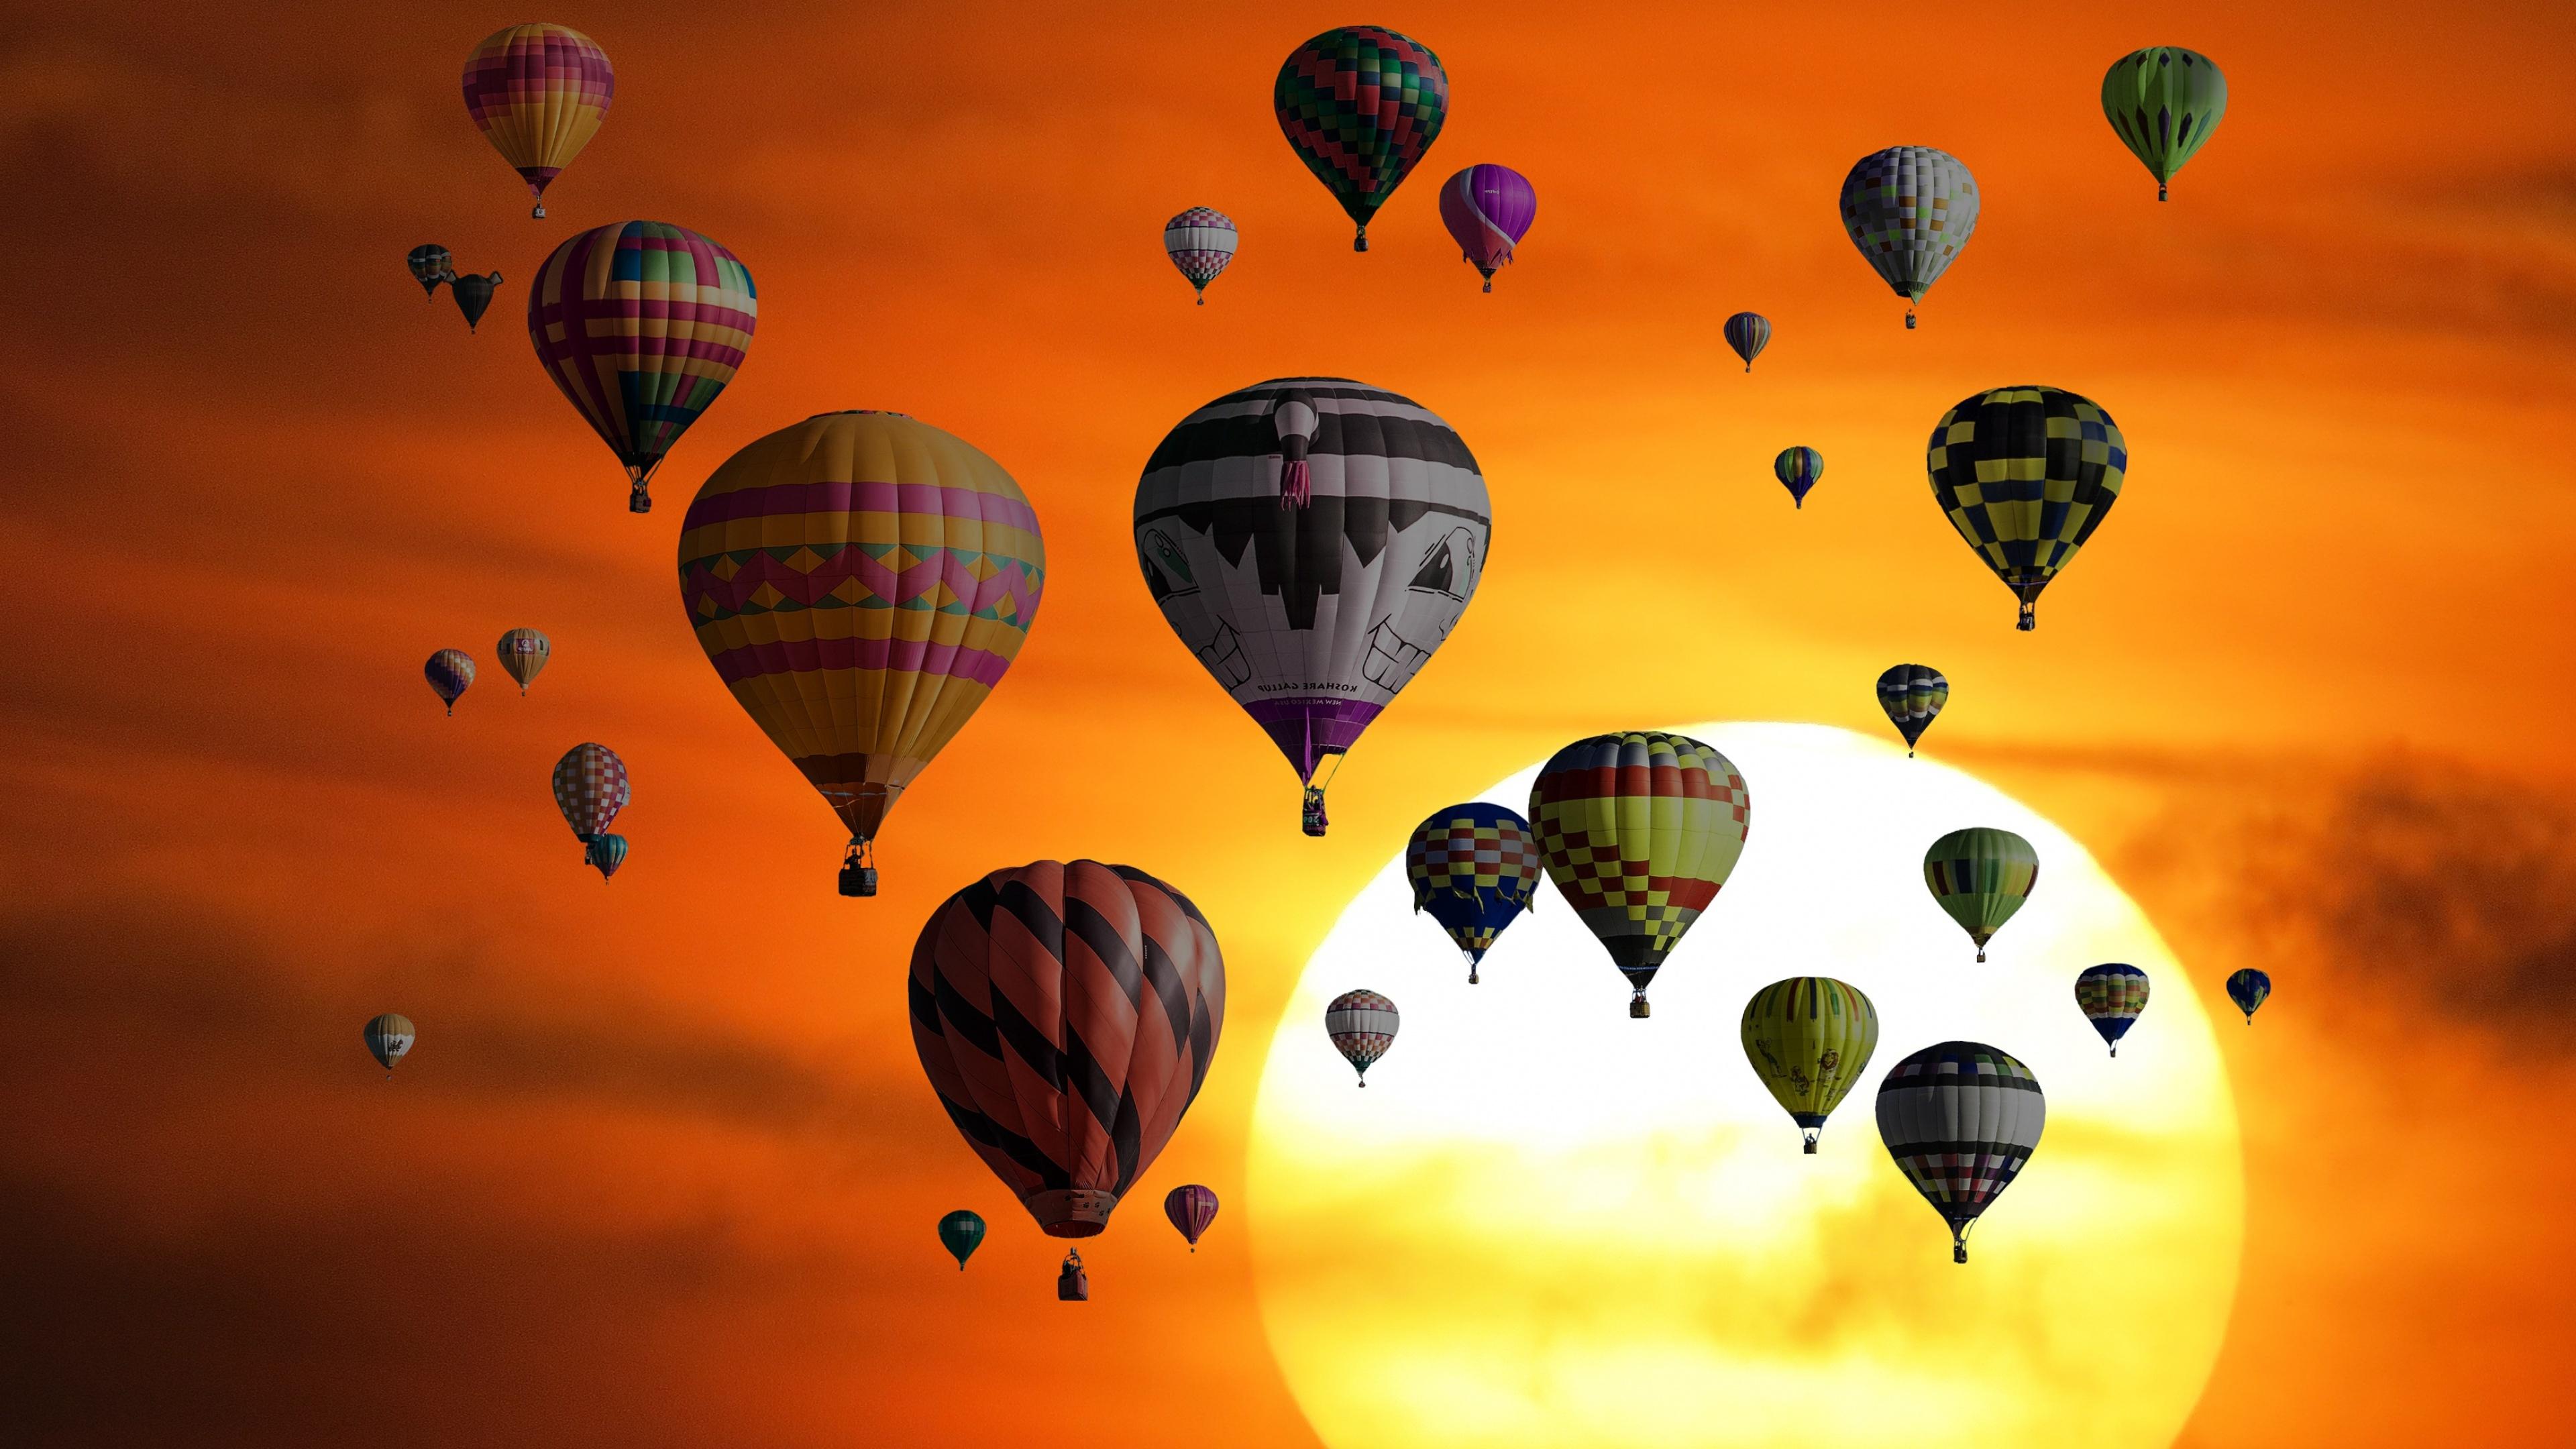 Hot Air Balloons 4k Wallpaper Sunset Orange Sky Travel Vacation Holidays Adventure Sky View Photography 3363